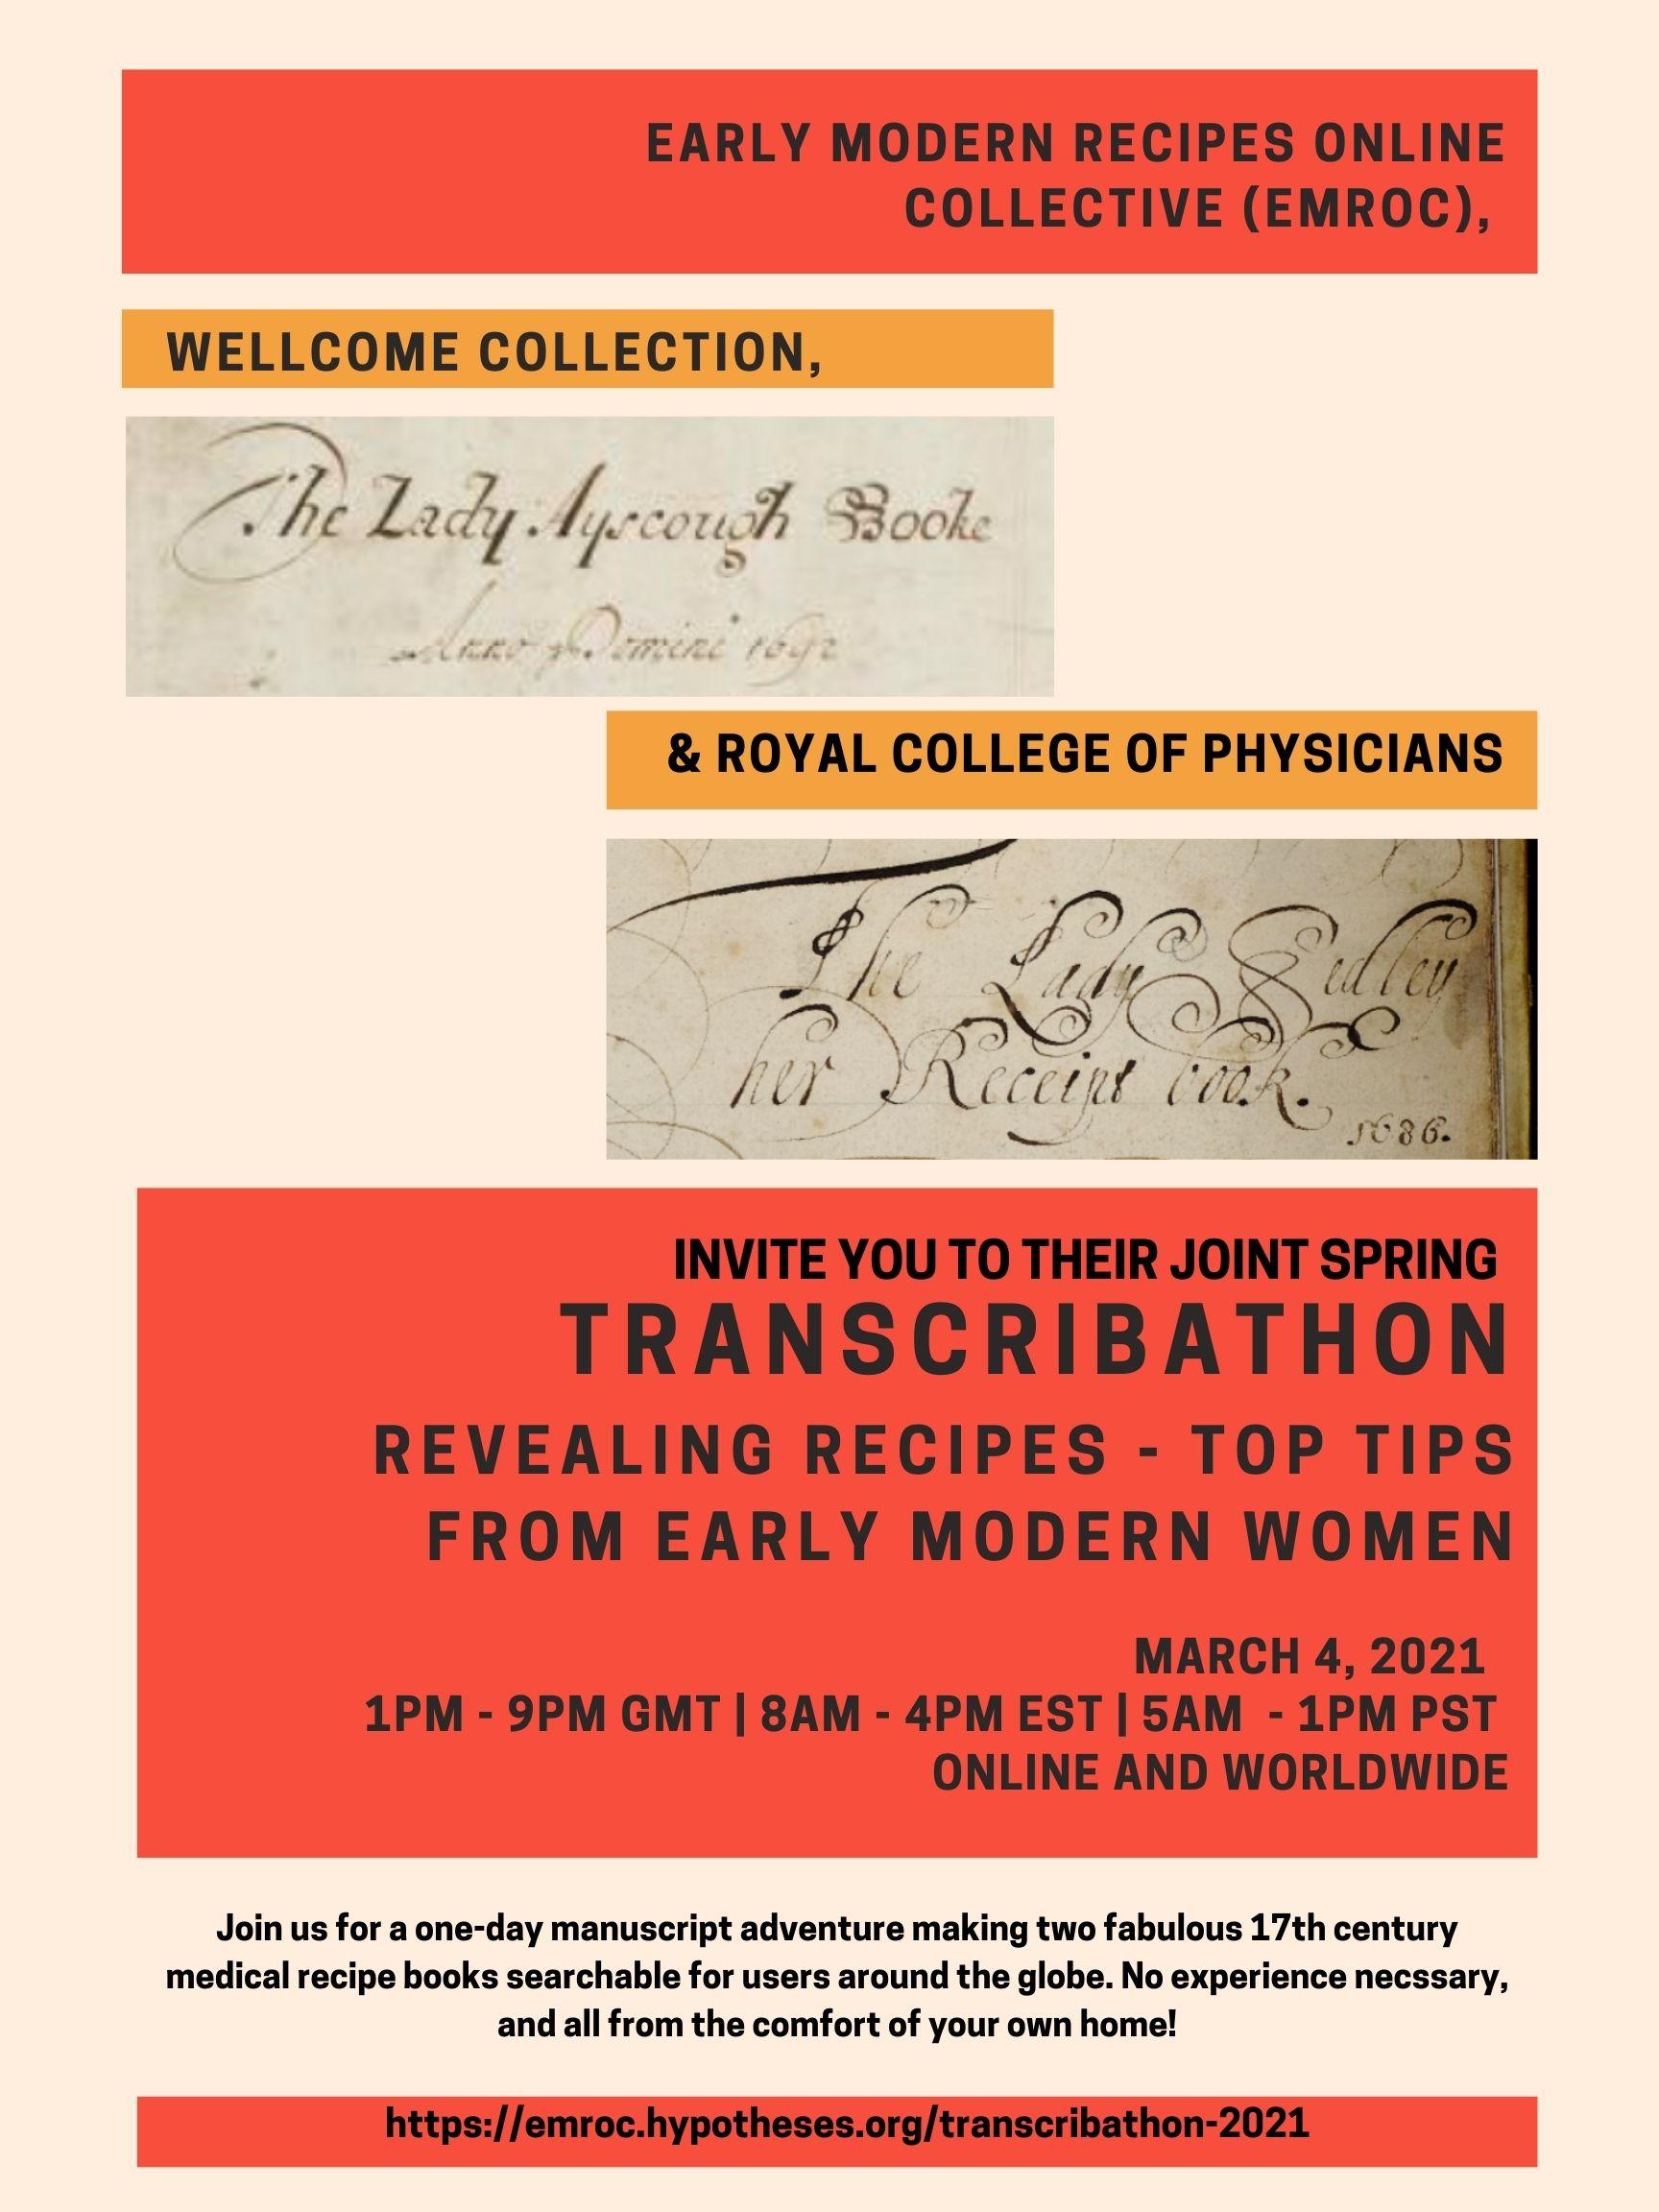 Transcribathon Instructions Glossaries And More Emroc